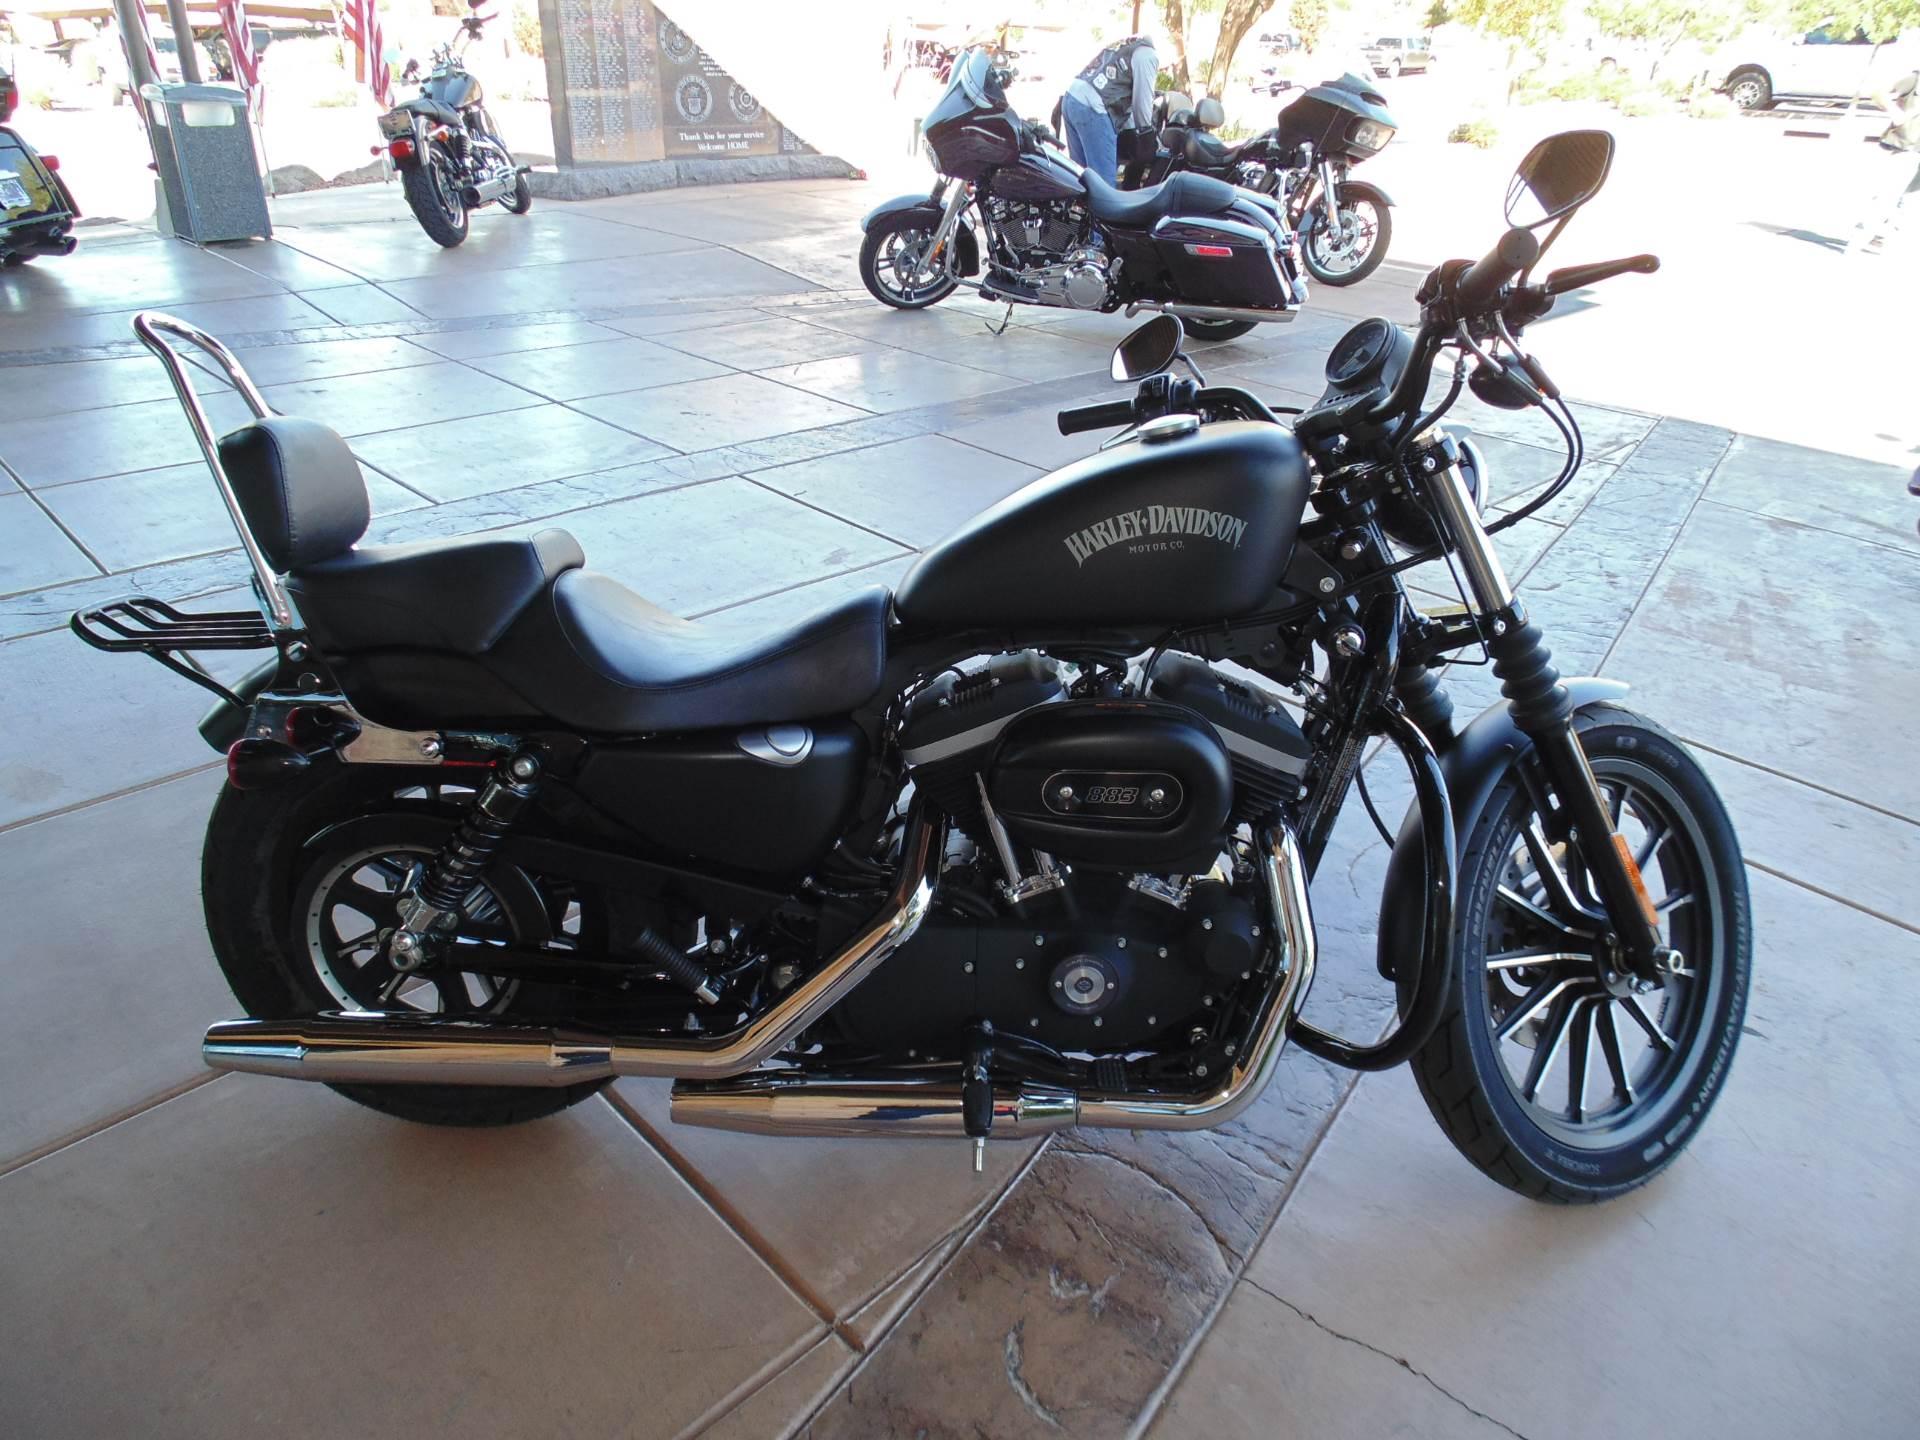 2013 Harley-Davidson Sportster Iron 883 for sale 1796